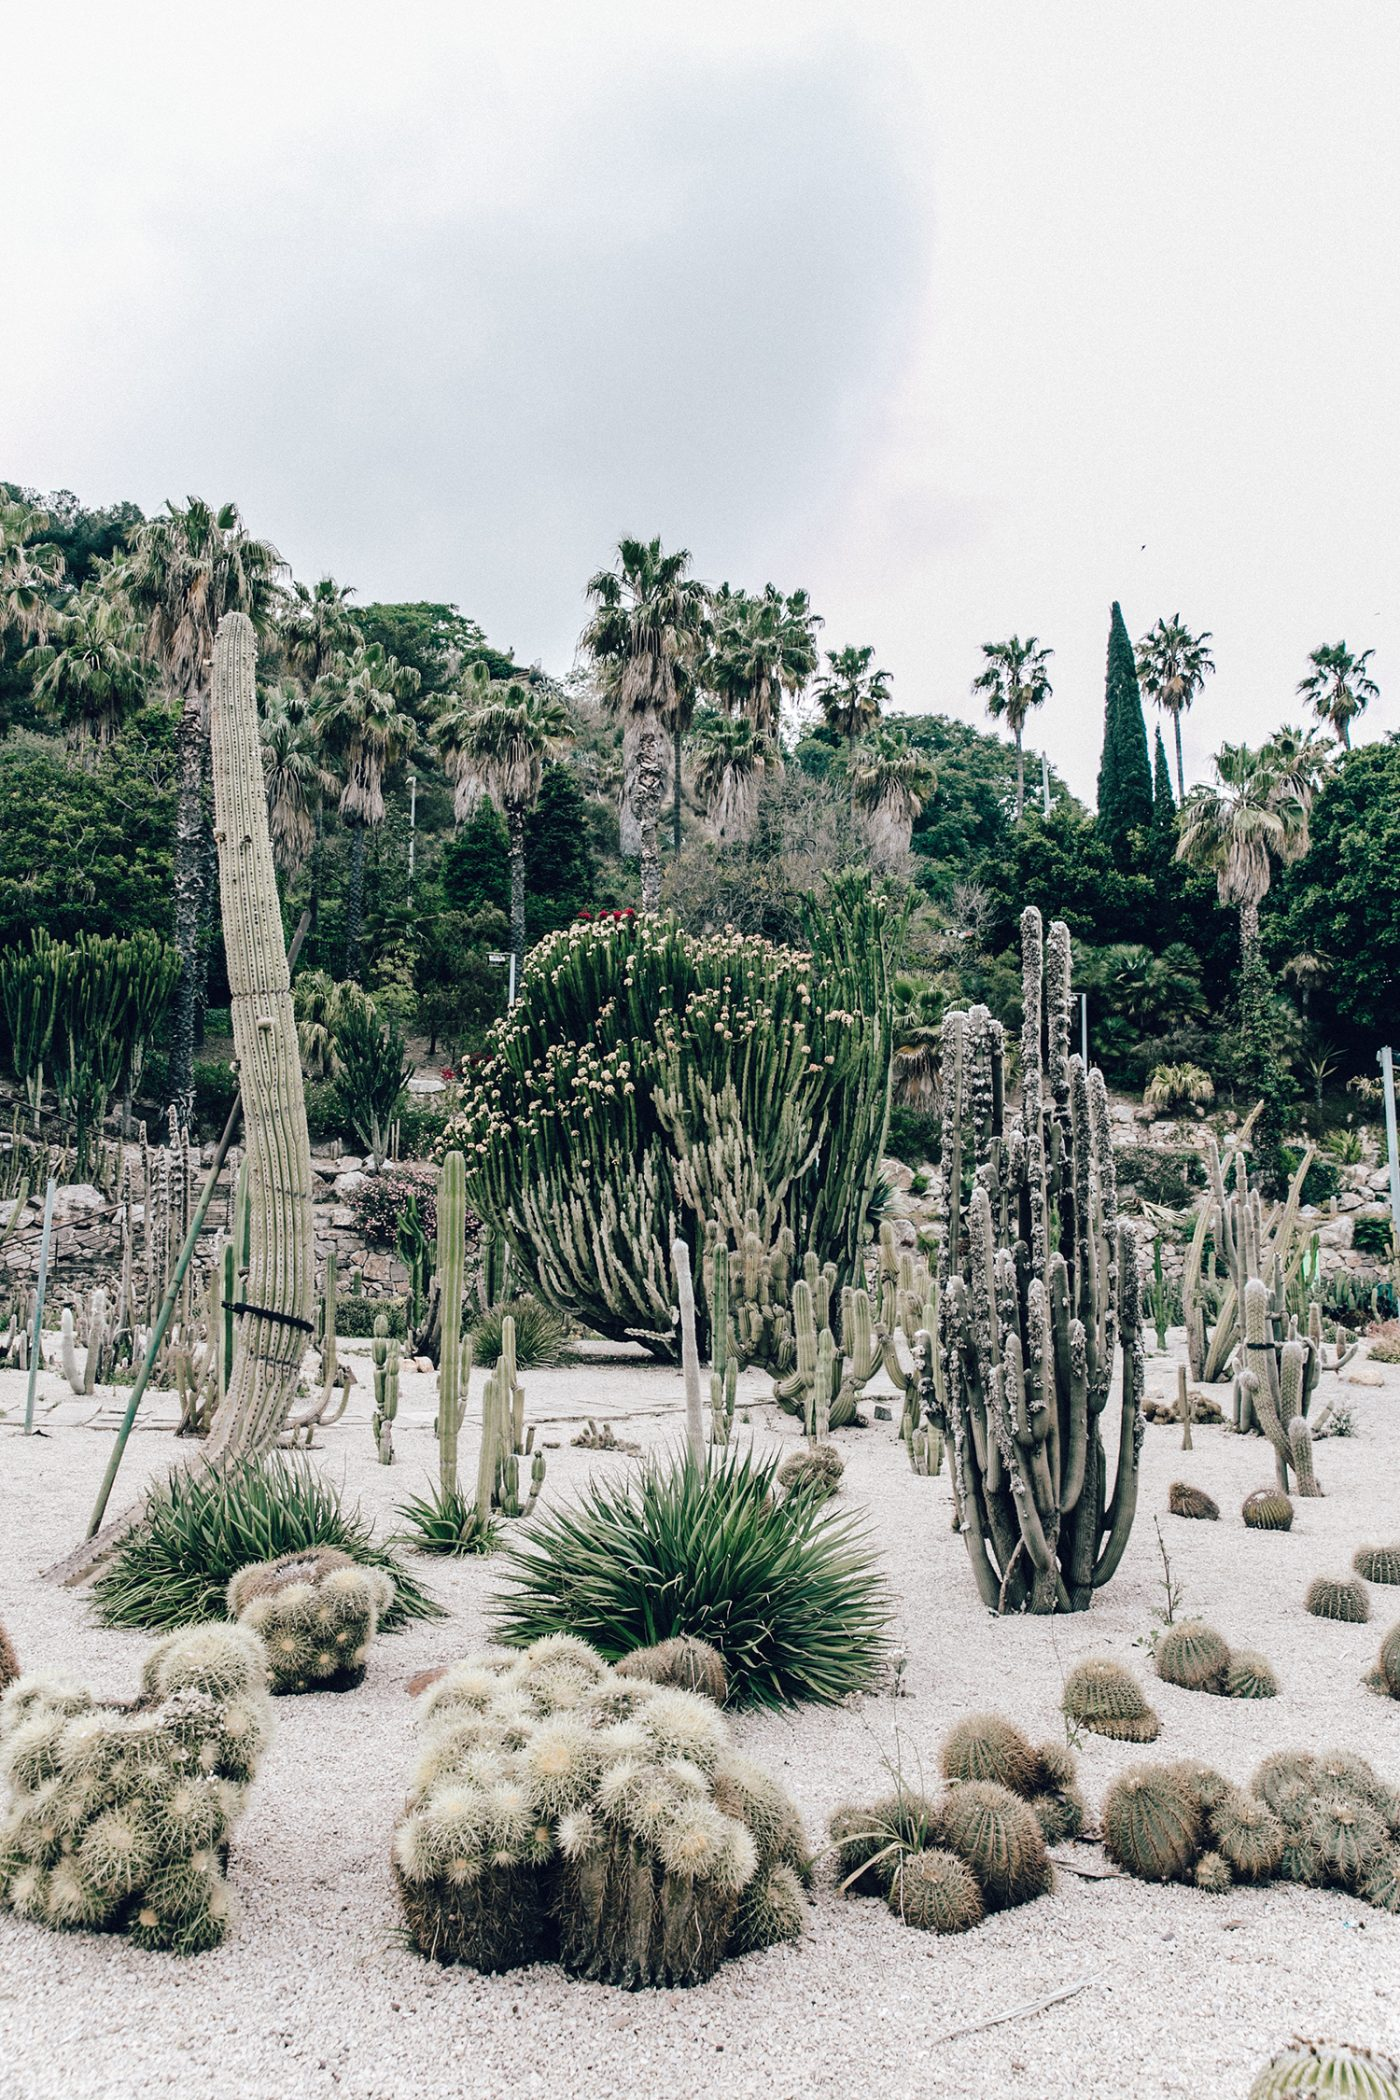 Realisation_Par_Dress-Star_Print-Red_Dress-Outfit-Catonier-Hat-Lack_Of_Color-Black_Sandals_Topshop-Barcelona-Collage_Vintage-Mossen_Gardens-140